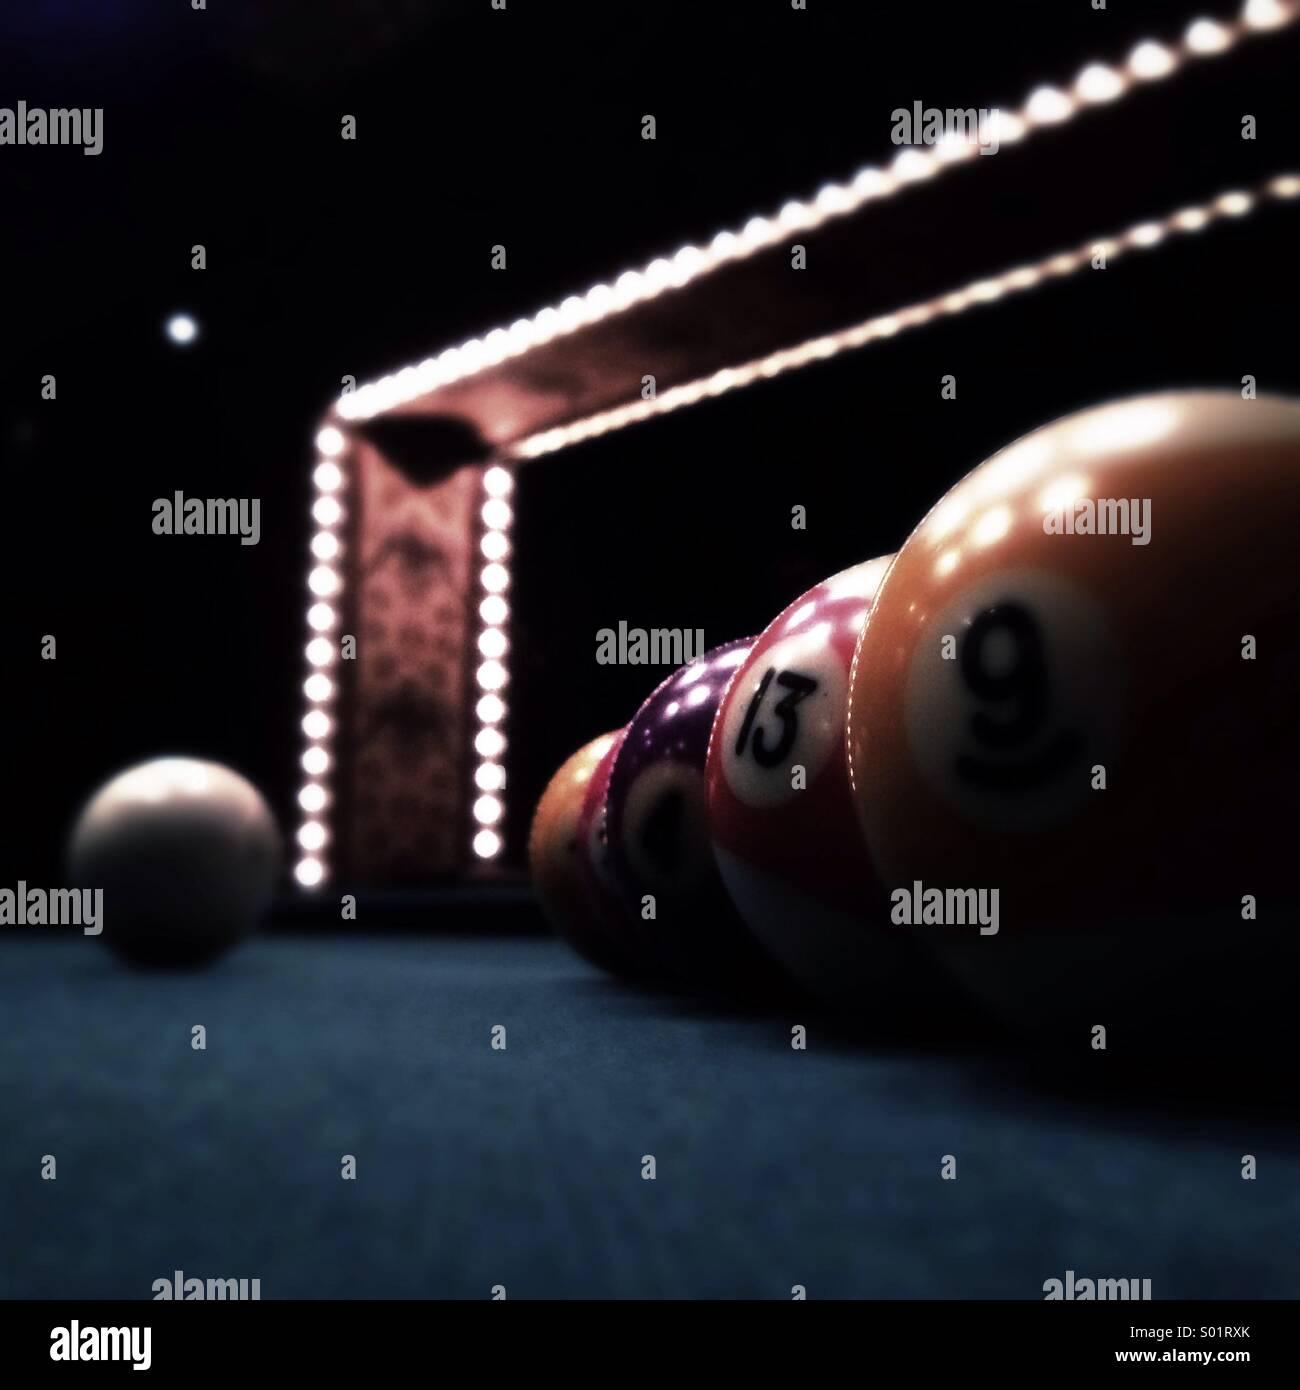 Billiard balls - Stock Image